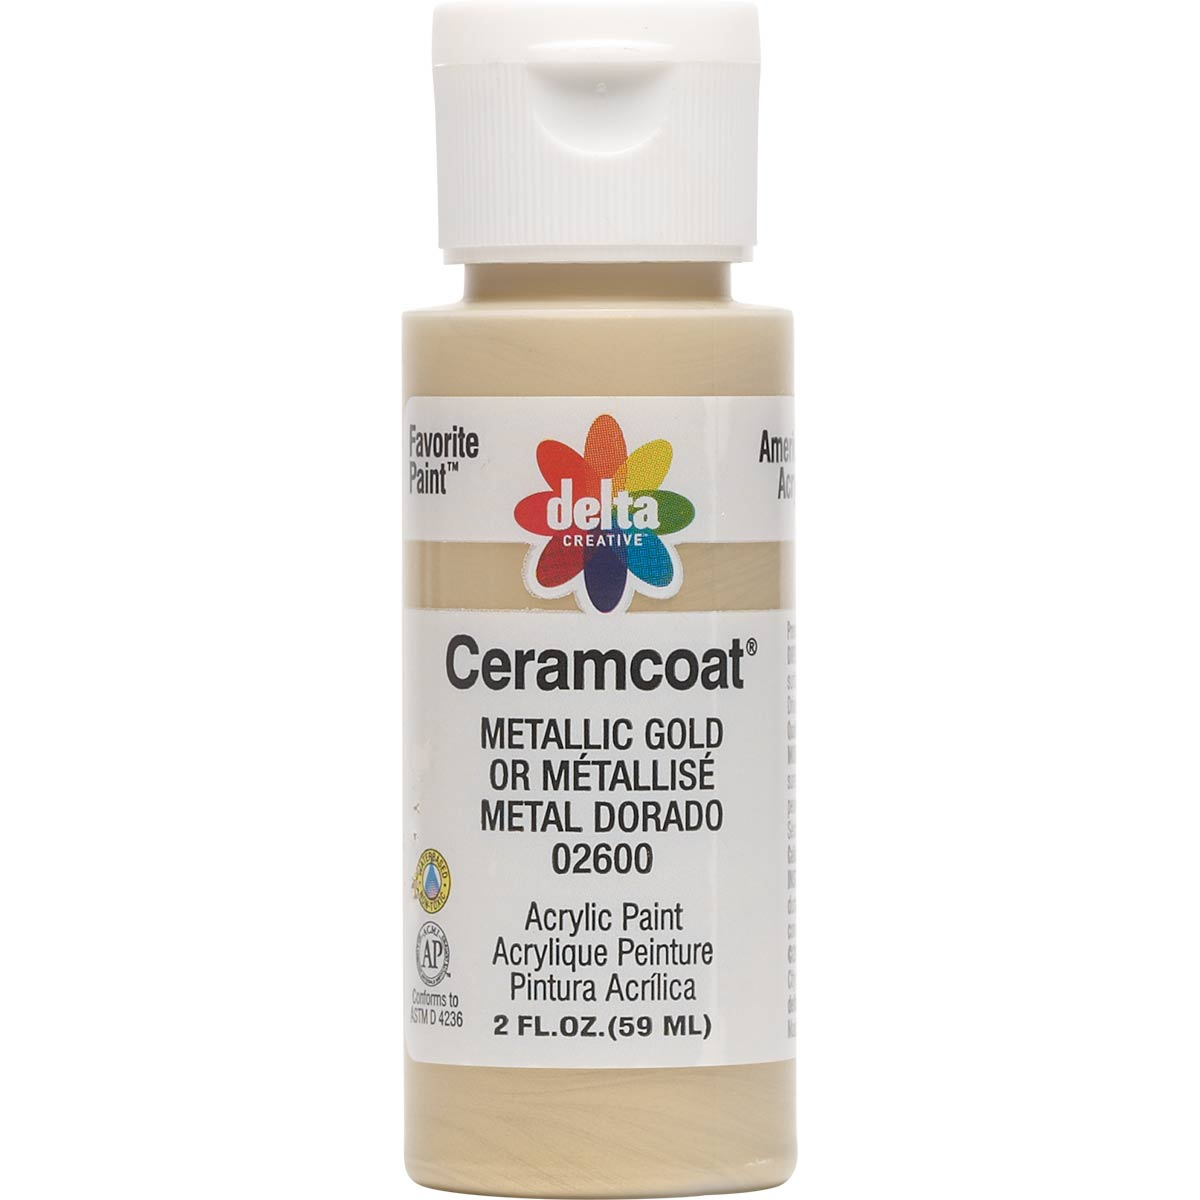 Delta Ceramcoat ® Acrylic Paint - Metallic Gold, 2 oz.